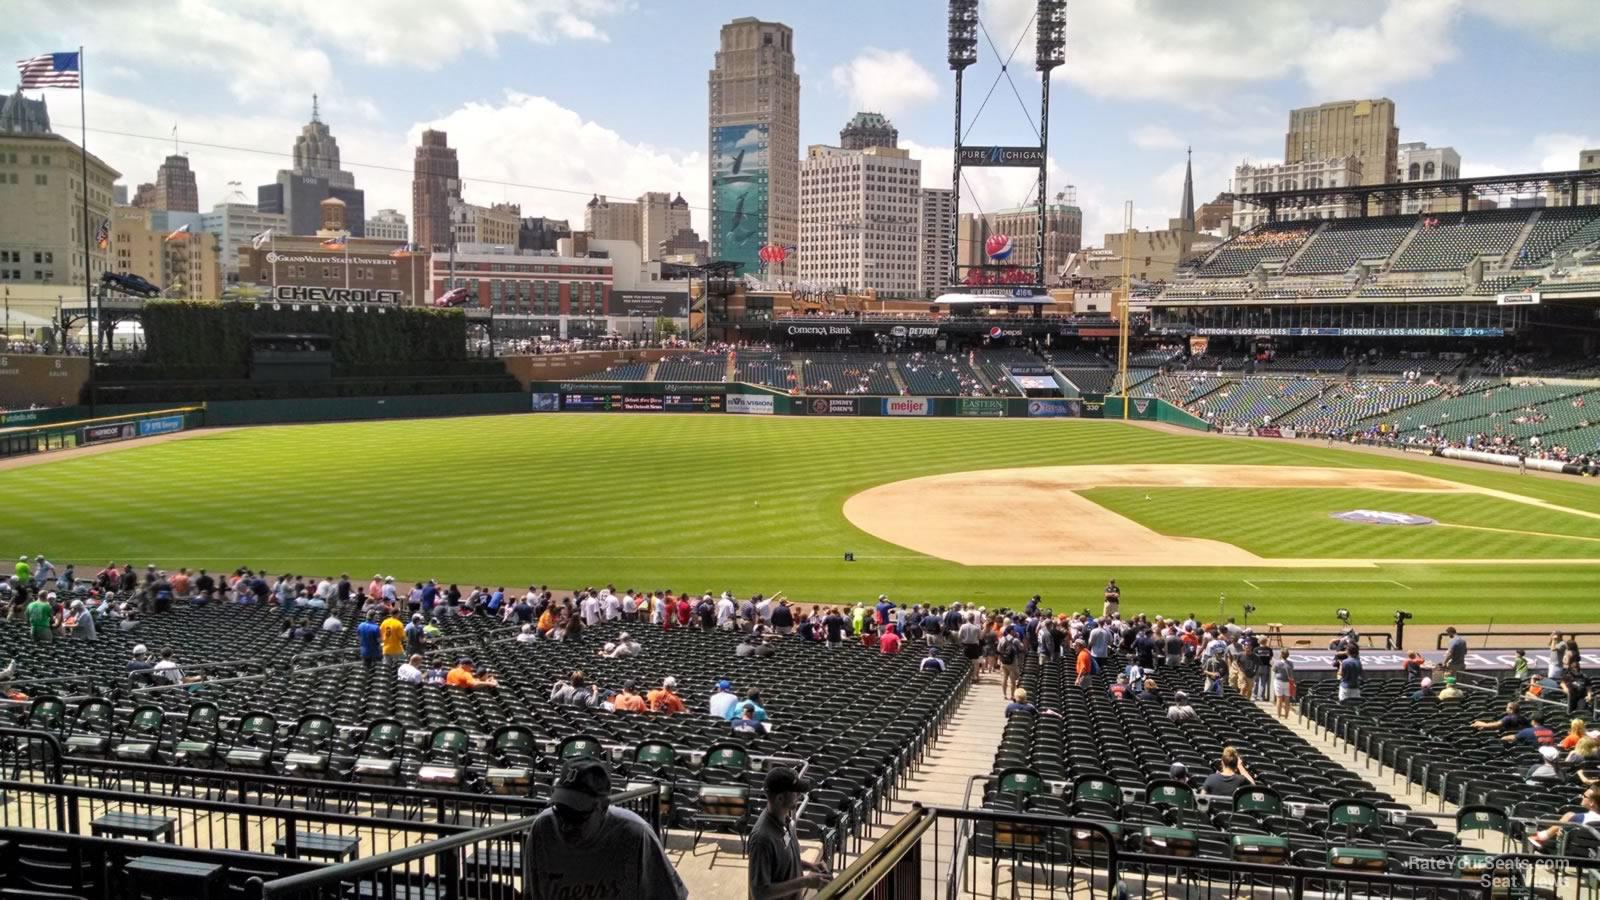 Comerica Park Terrace 136 - Detroit Tigers - RateYourSeats.com